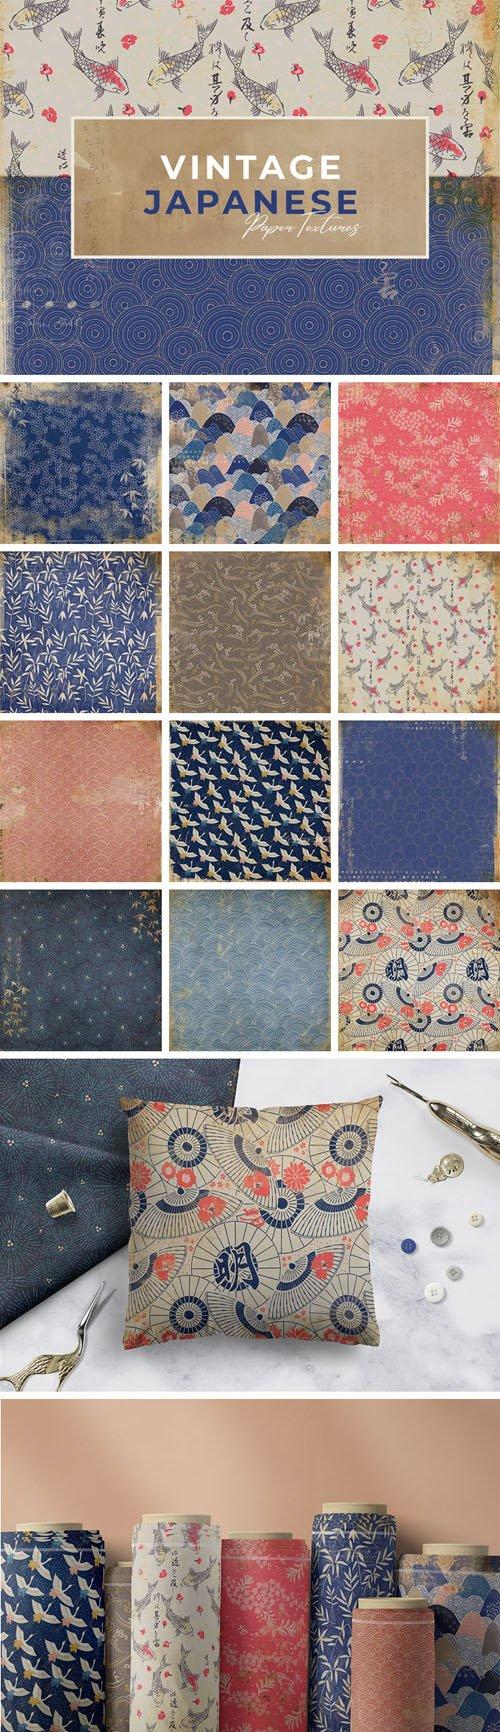 12 Vintage Japanese Paper Textures